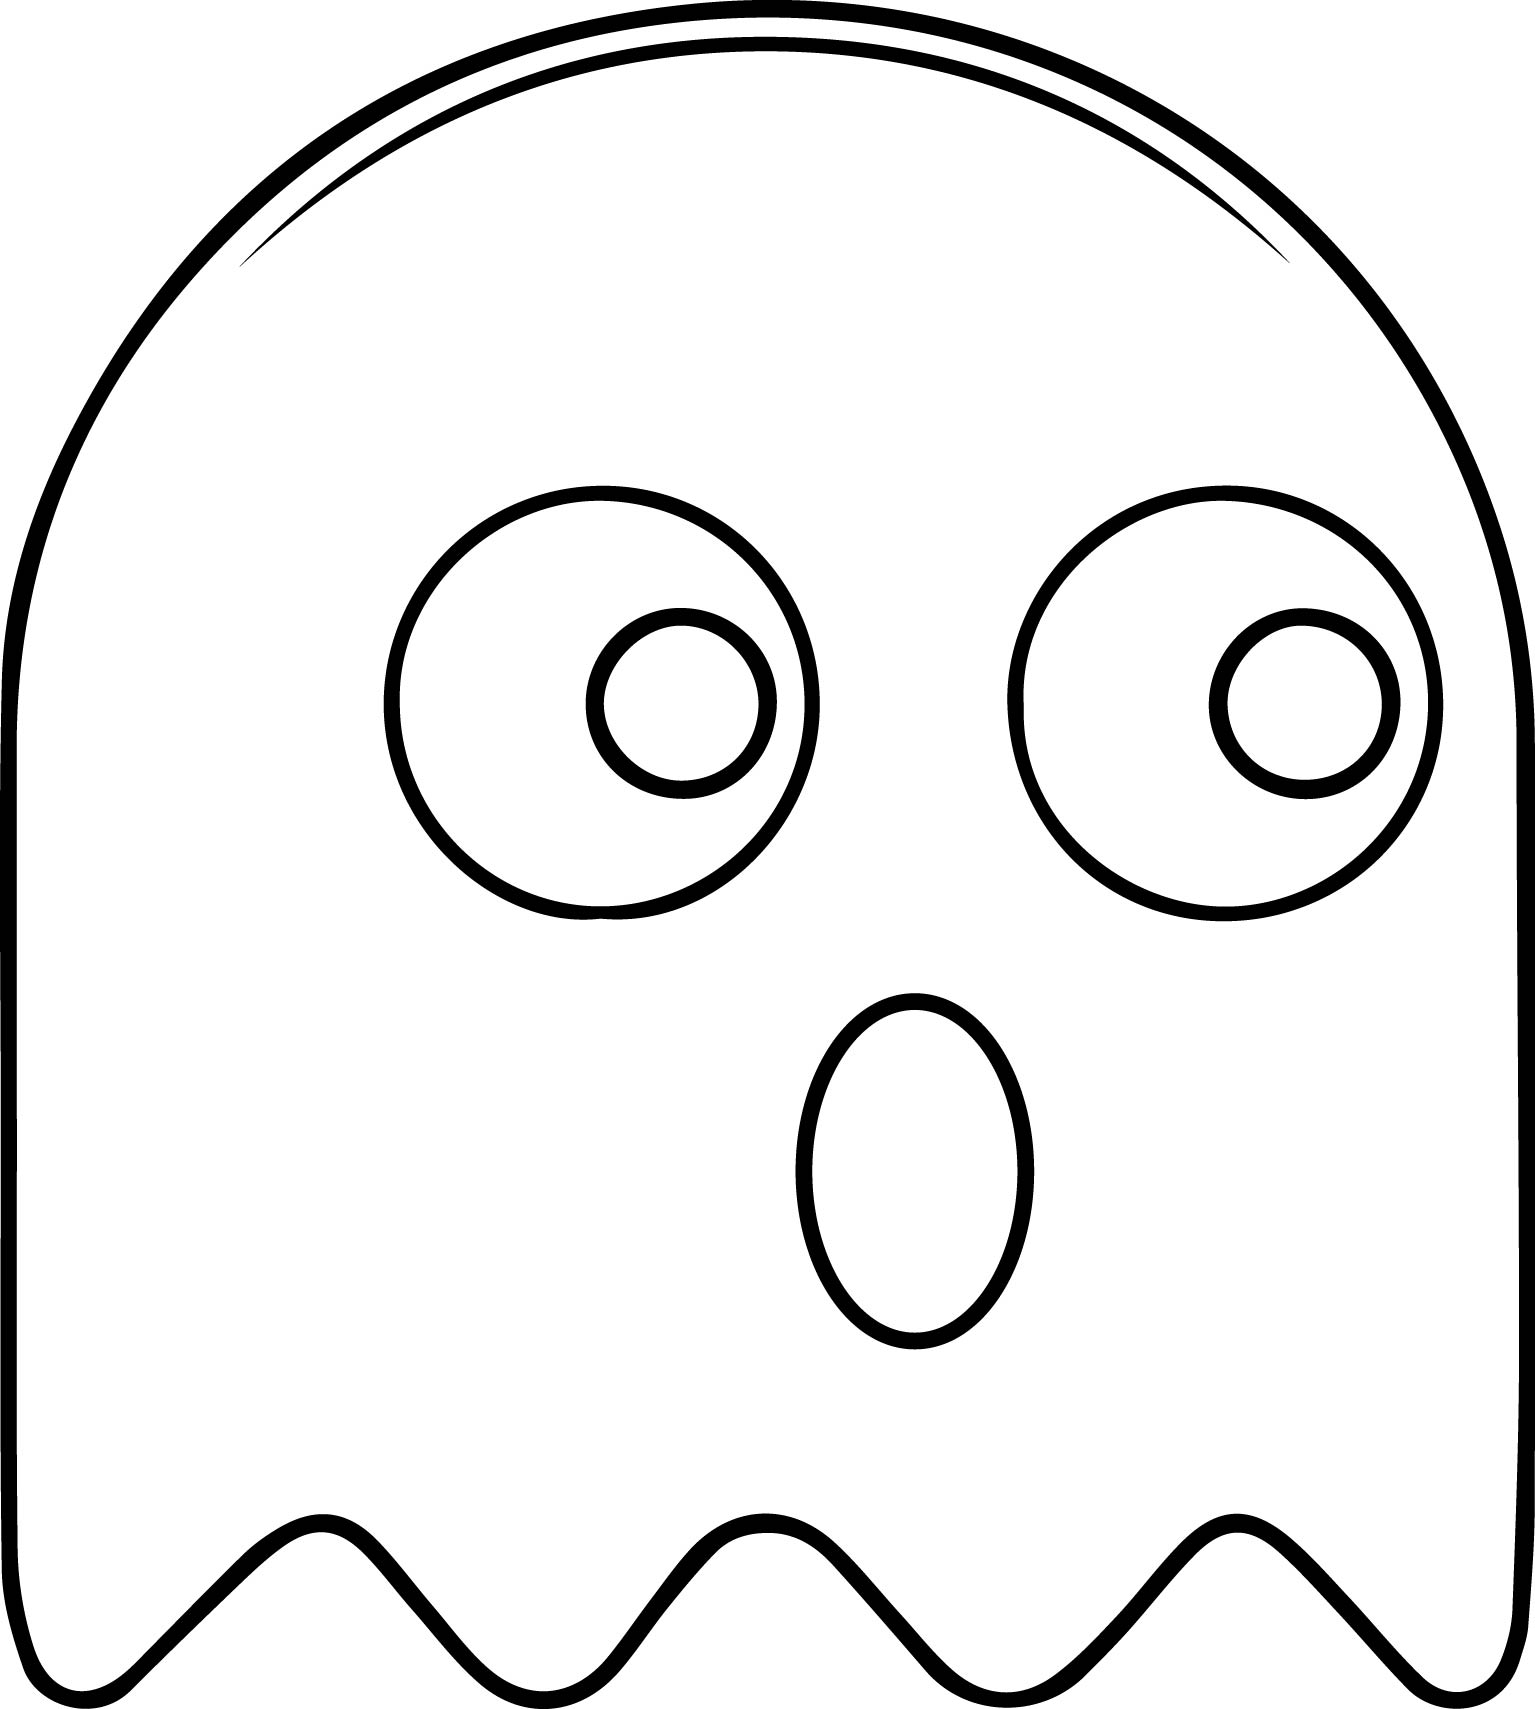 Pacman Drawing At Getdrawings